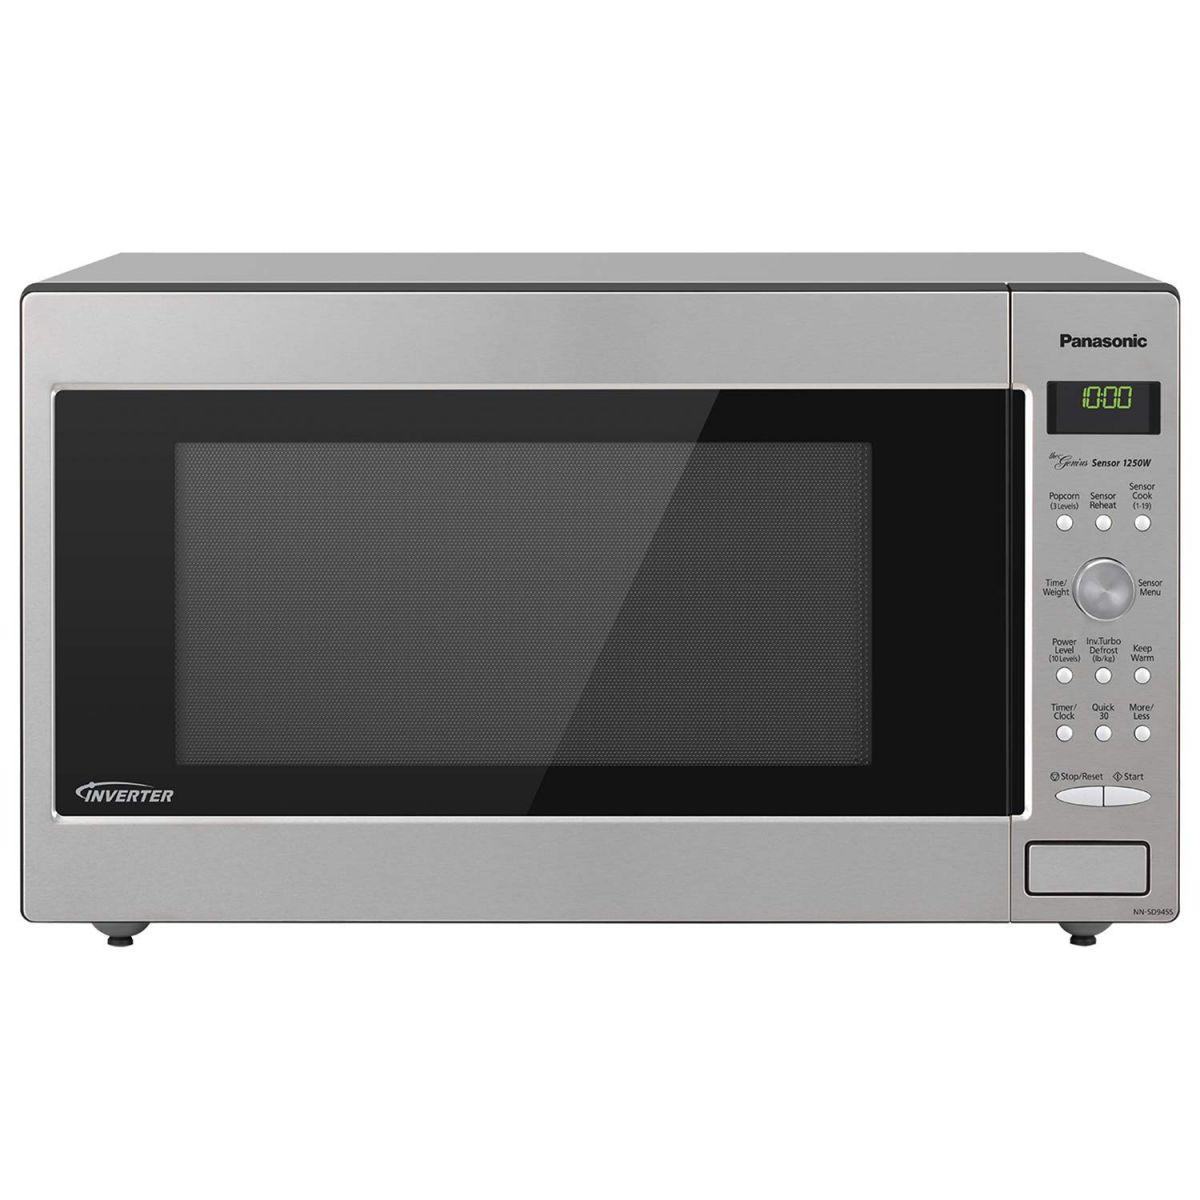 Panasonic NN-SN966S 1250 Watts Countertop Microwave Oven